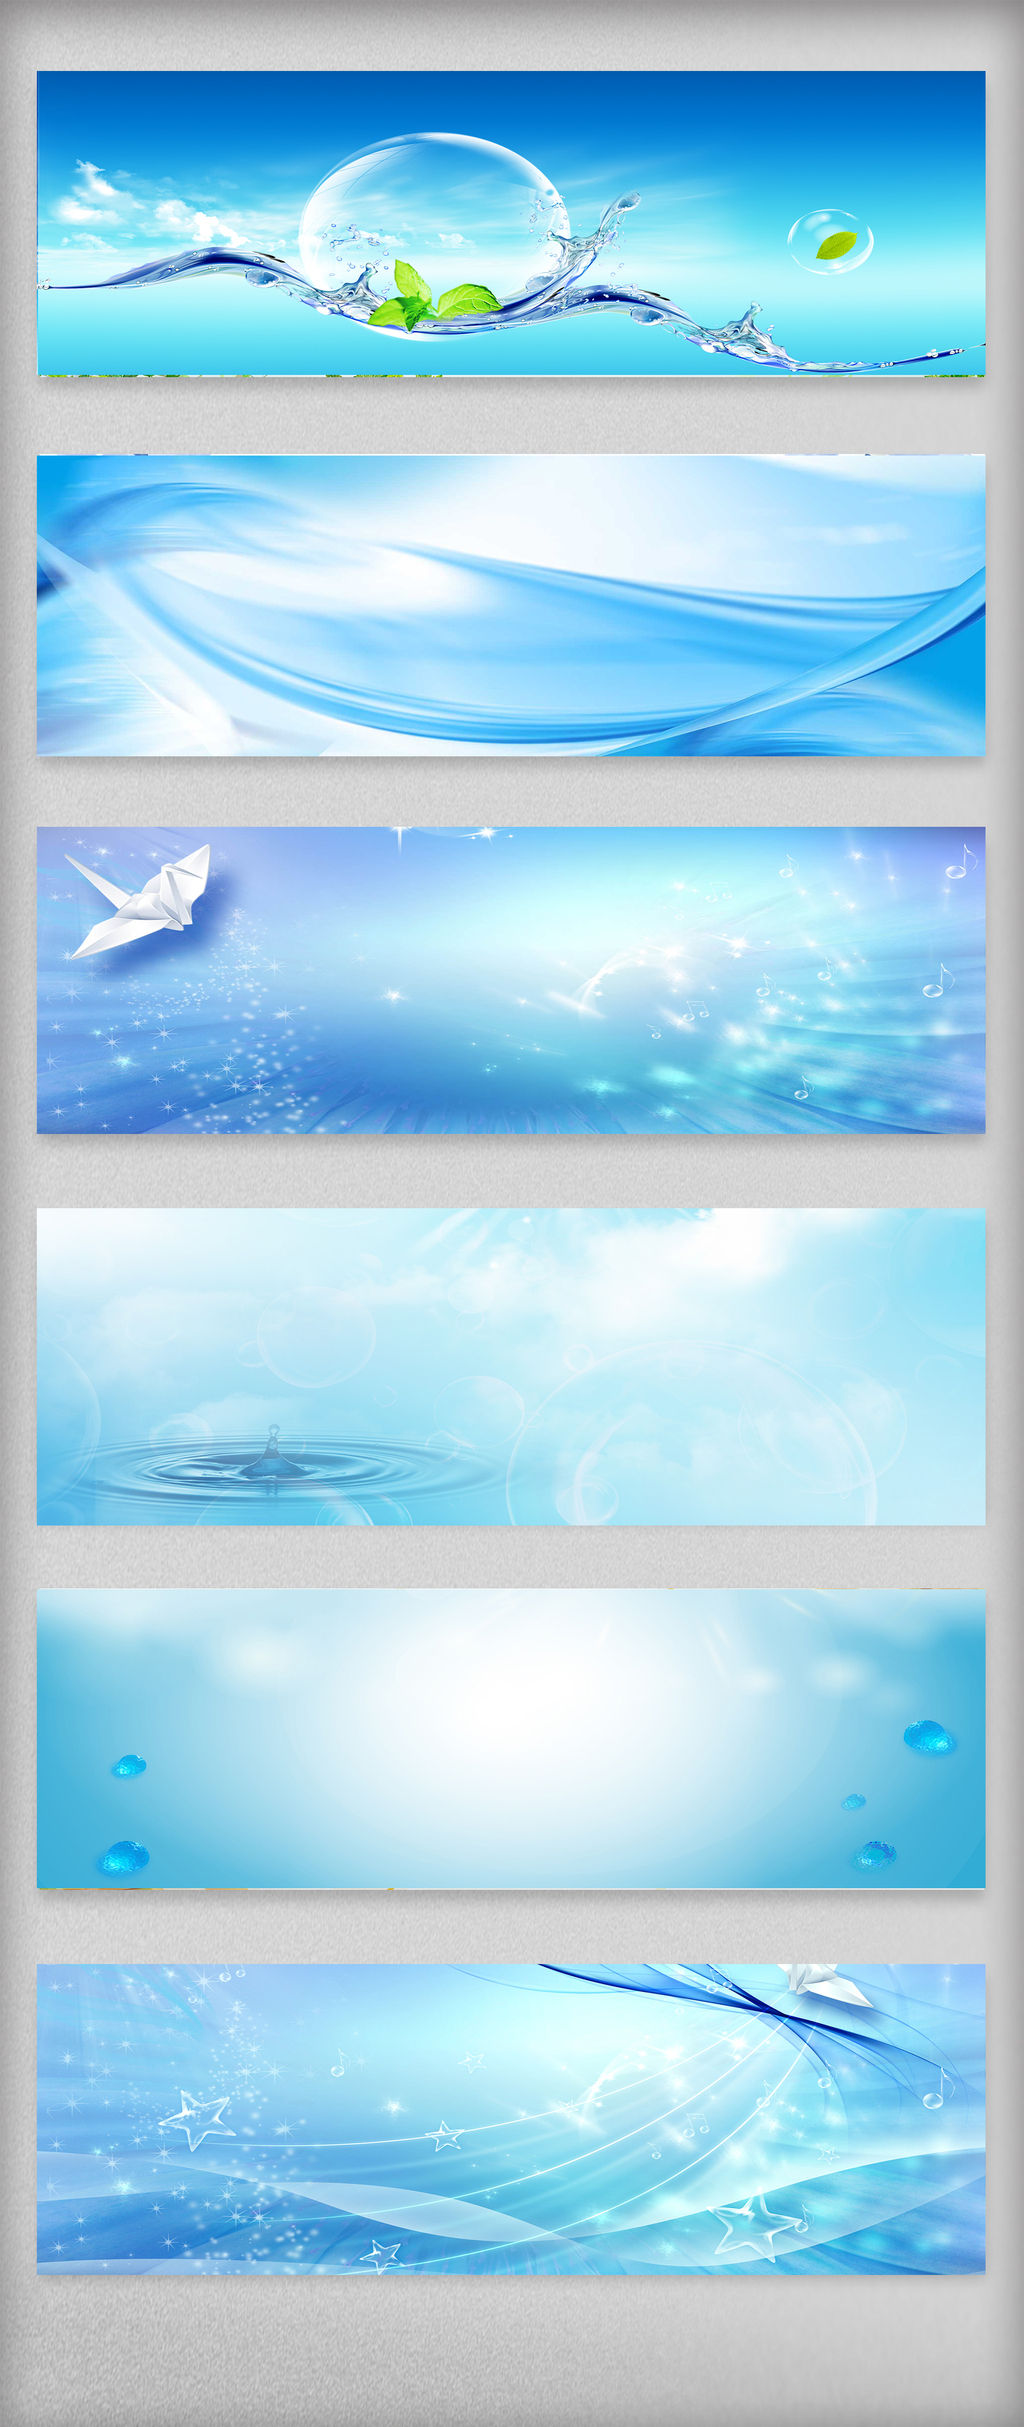 蓝色化妆品海报banner背景